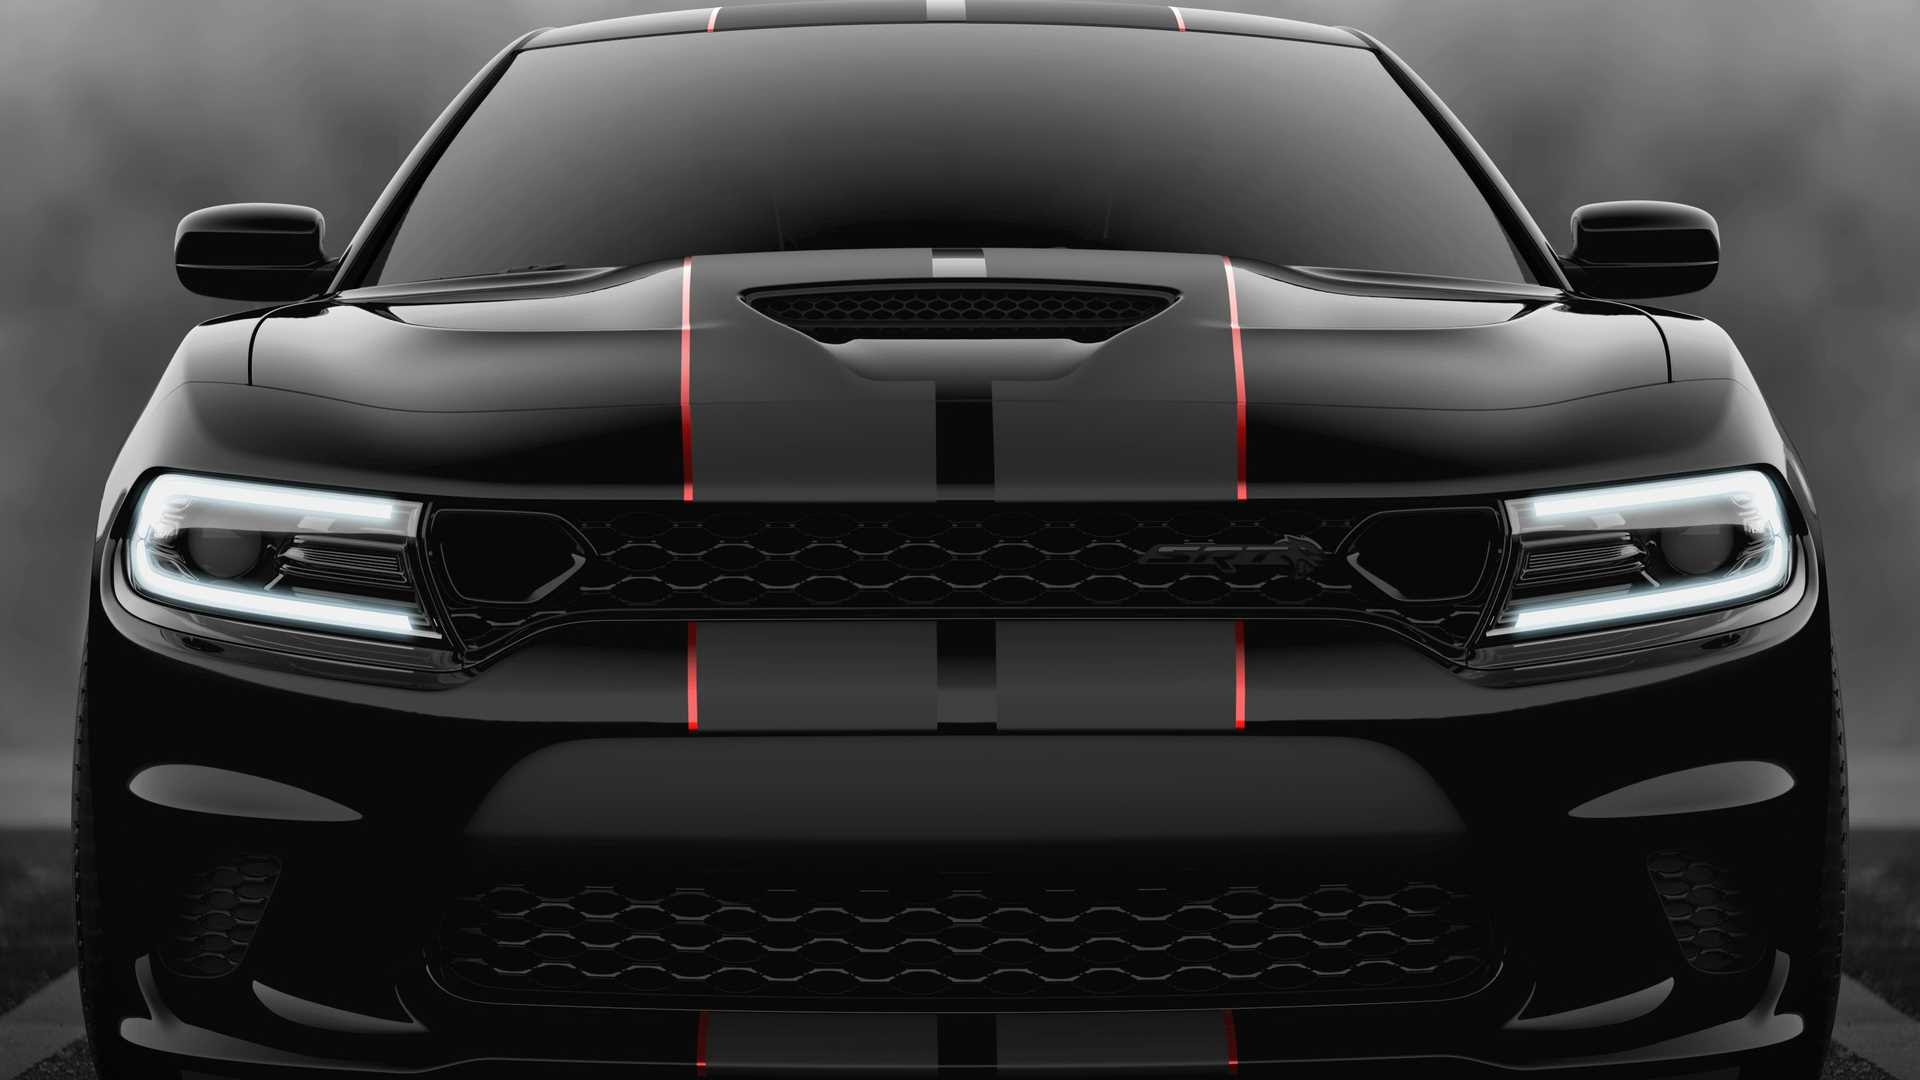 2019 Dodge Charger Srt Hellcat Octane Edition Color Pitch Black